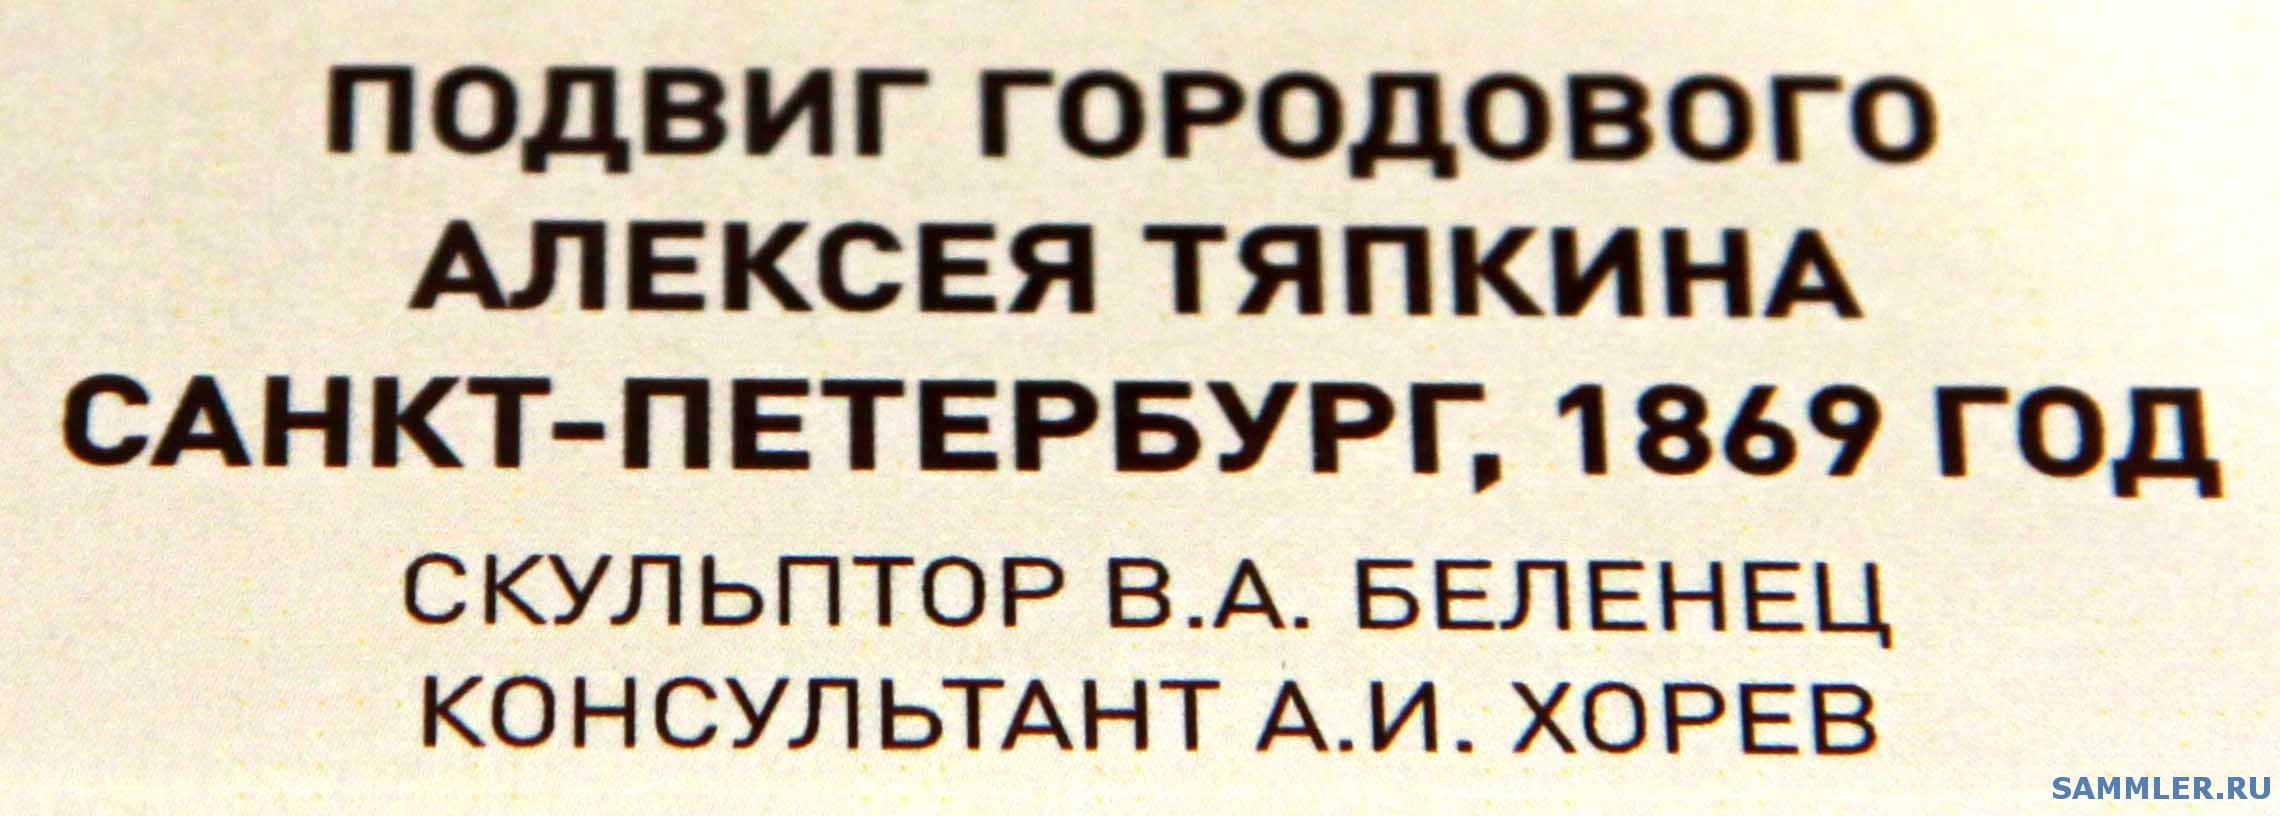 IMG_4135.jpg